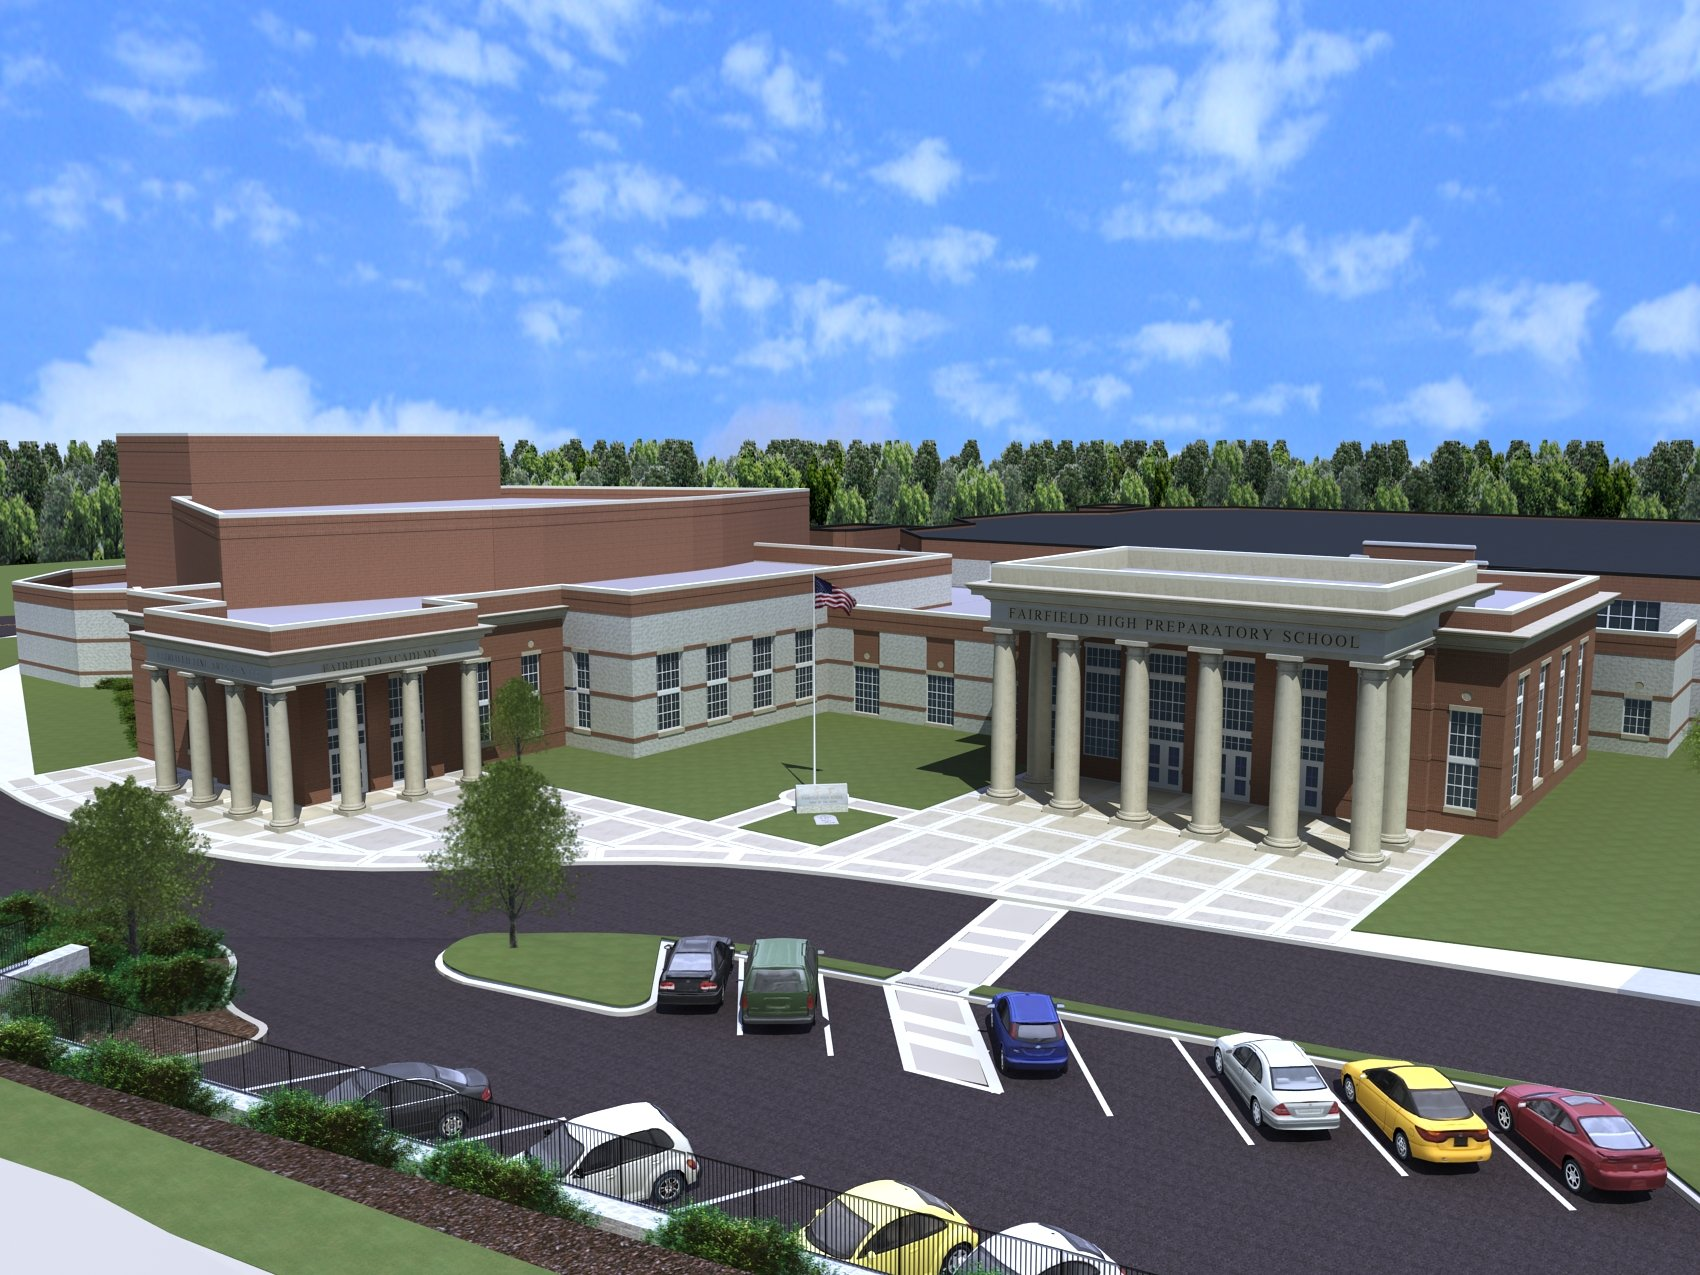 1700x1275 Fairfield Schools Begin 5 Year Plan, Including Building